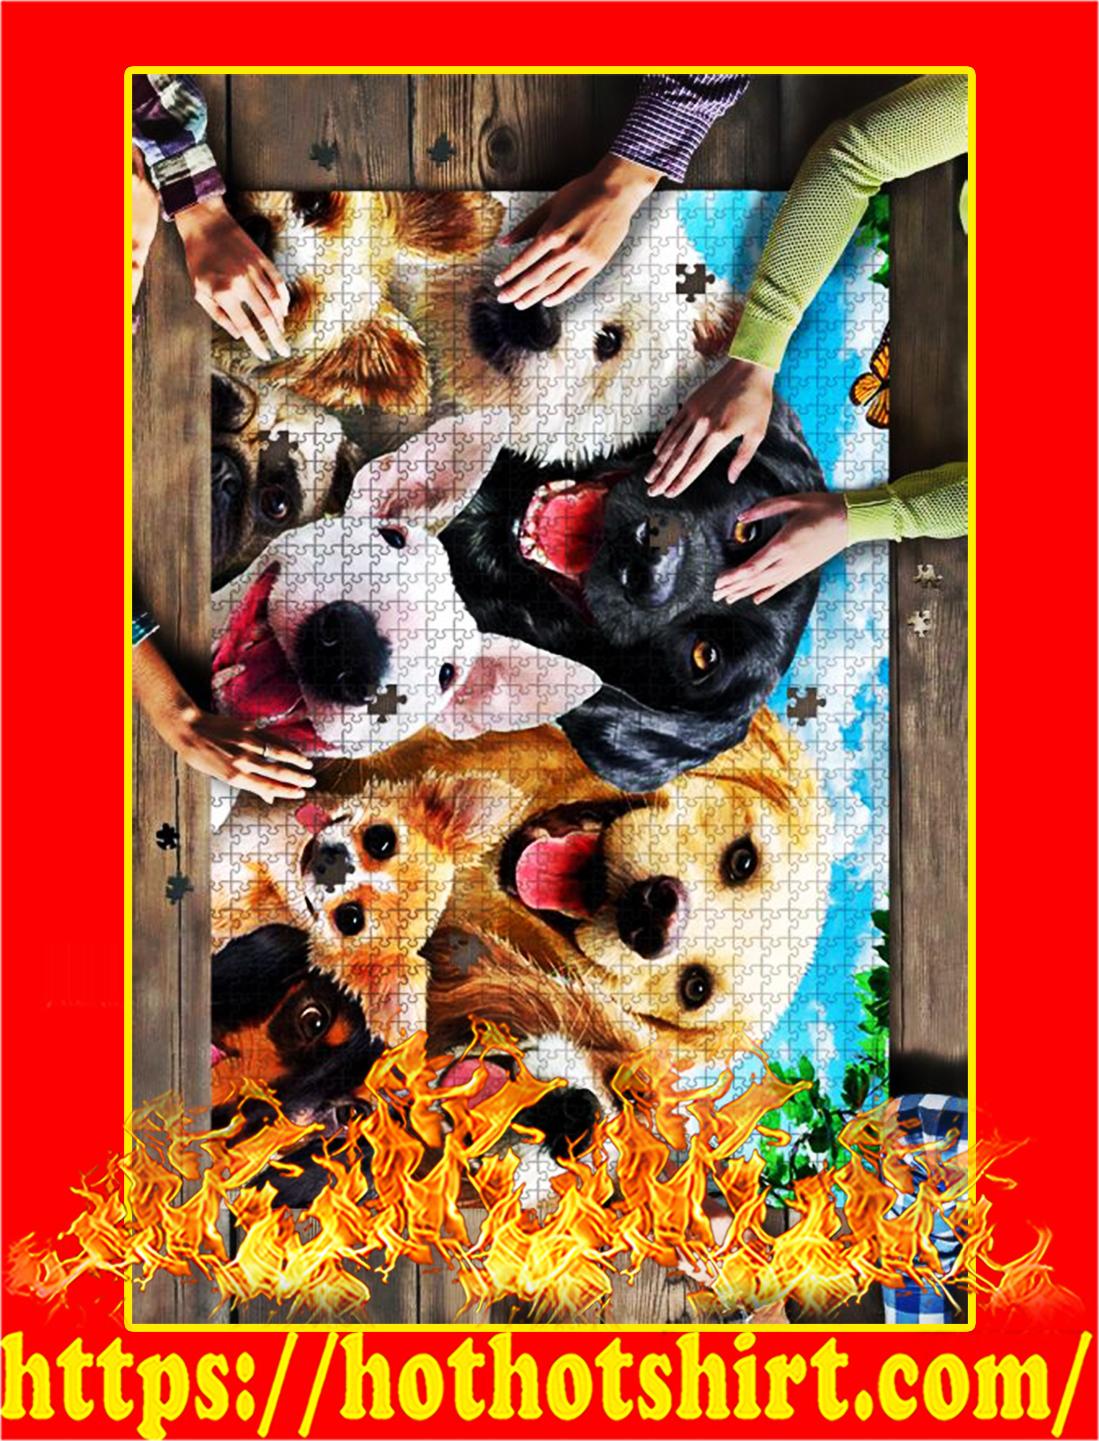 Dog Selfie Jigsaw Puzzle - 500 pieces